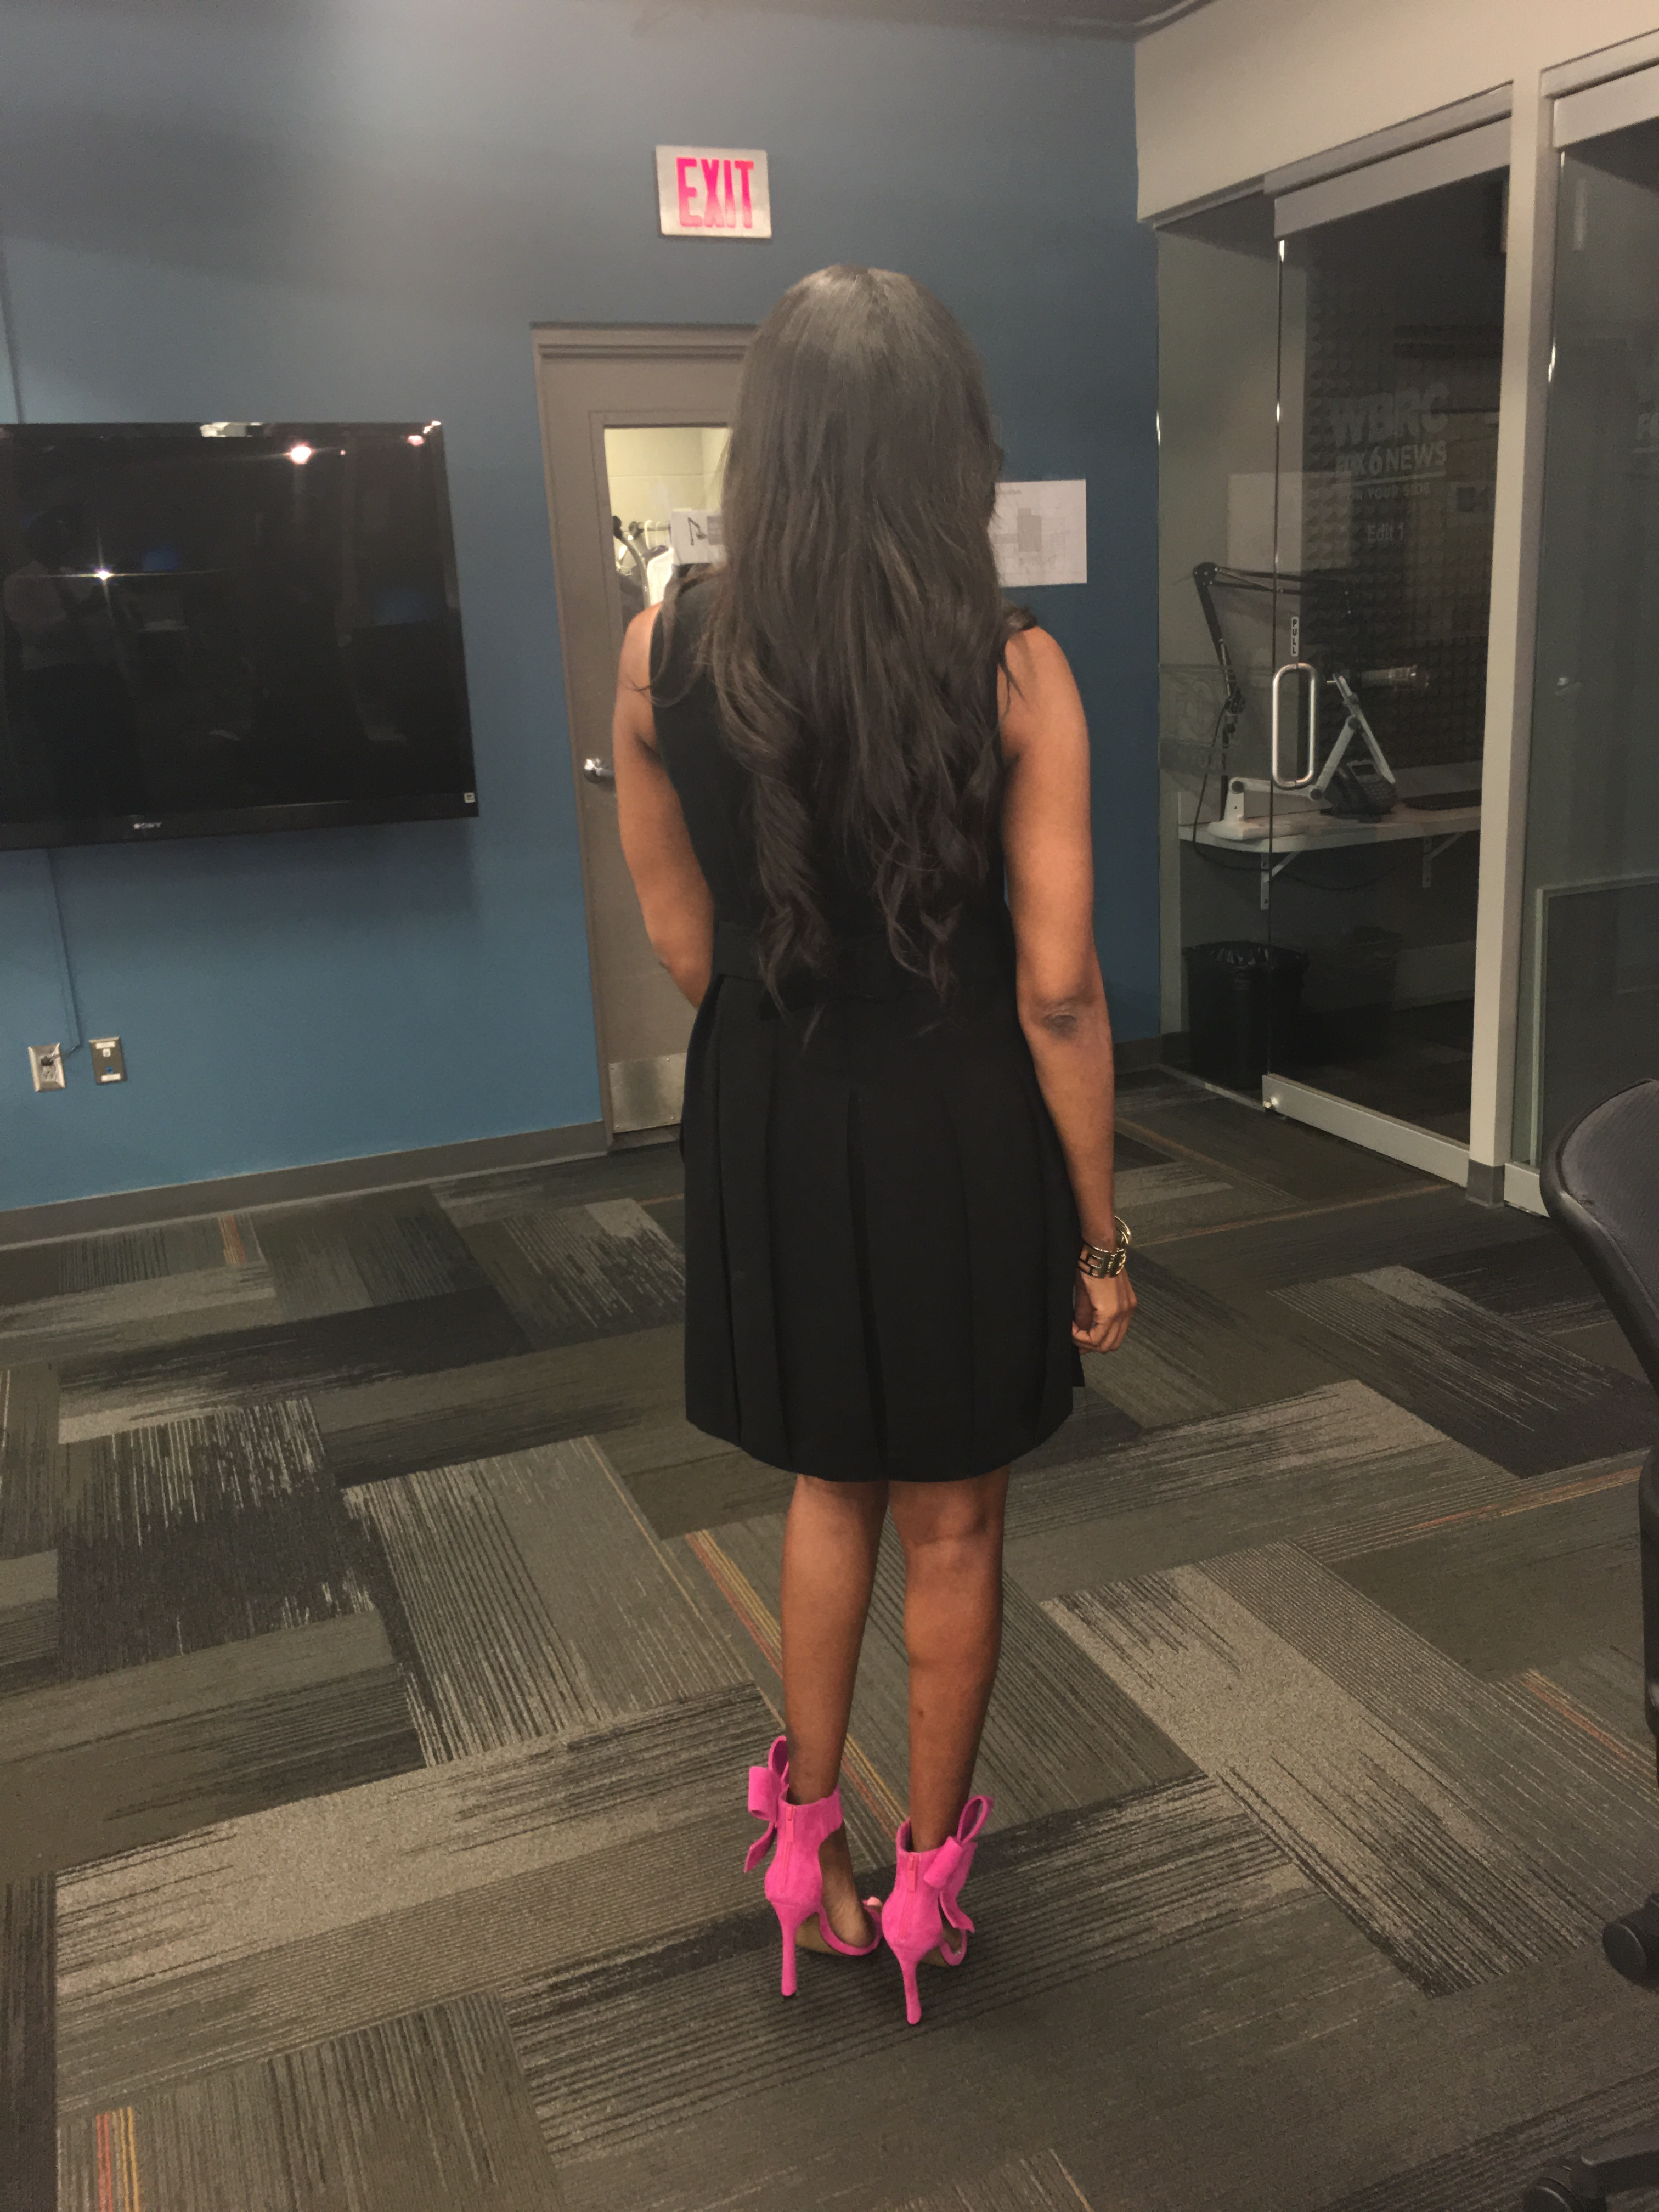 Style-files-jcpenney worthington-black-mockneck-sleeveless-dress-silver-front-button-embellishments-Betsey-Johnson-bow-sandals-